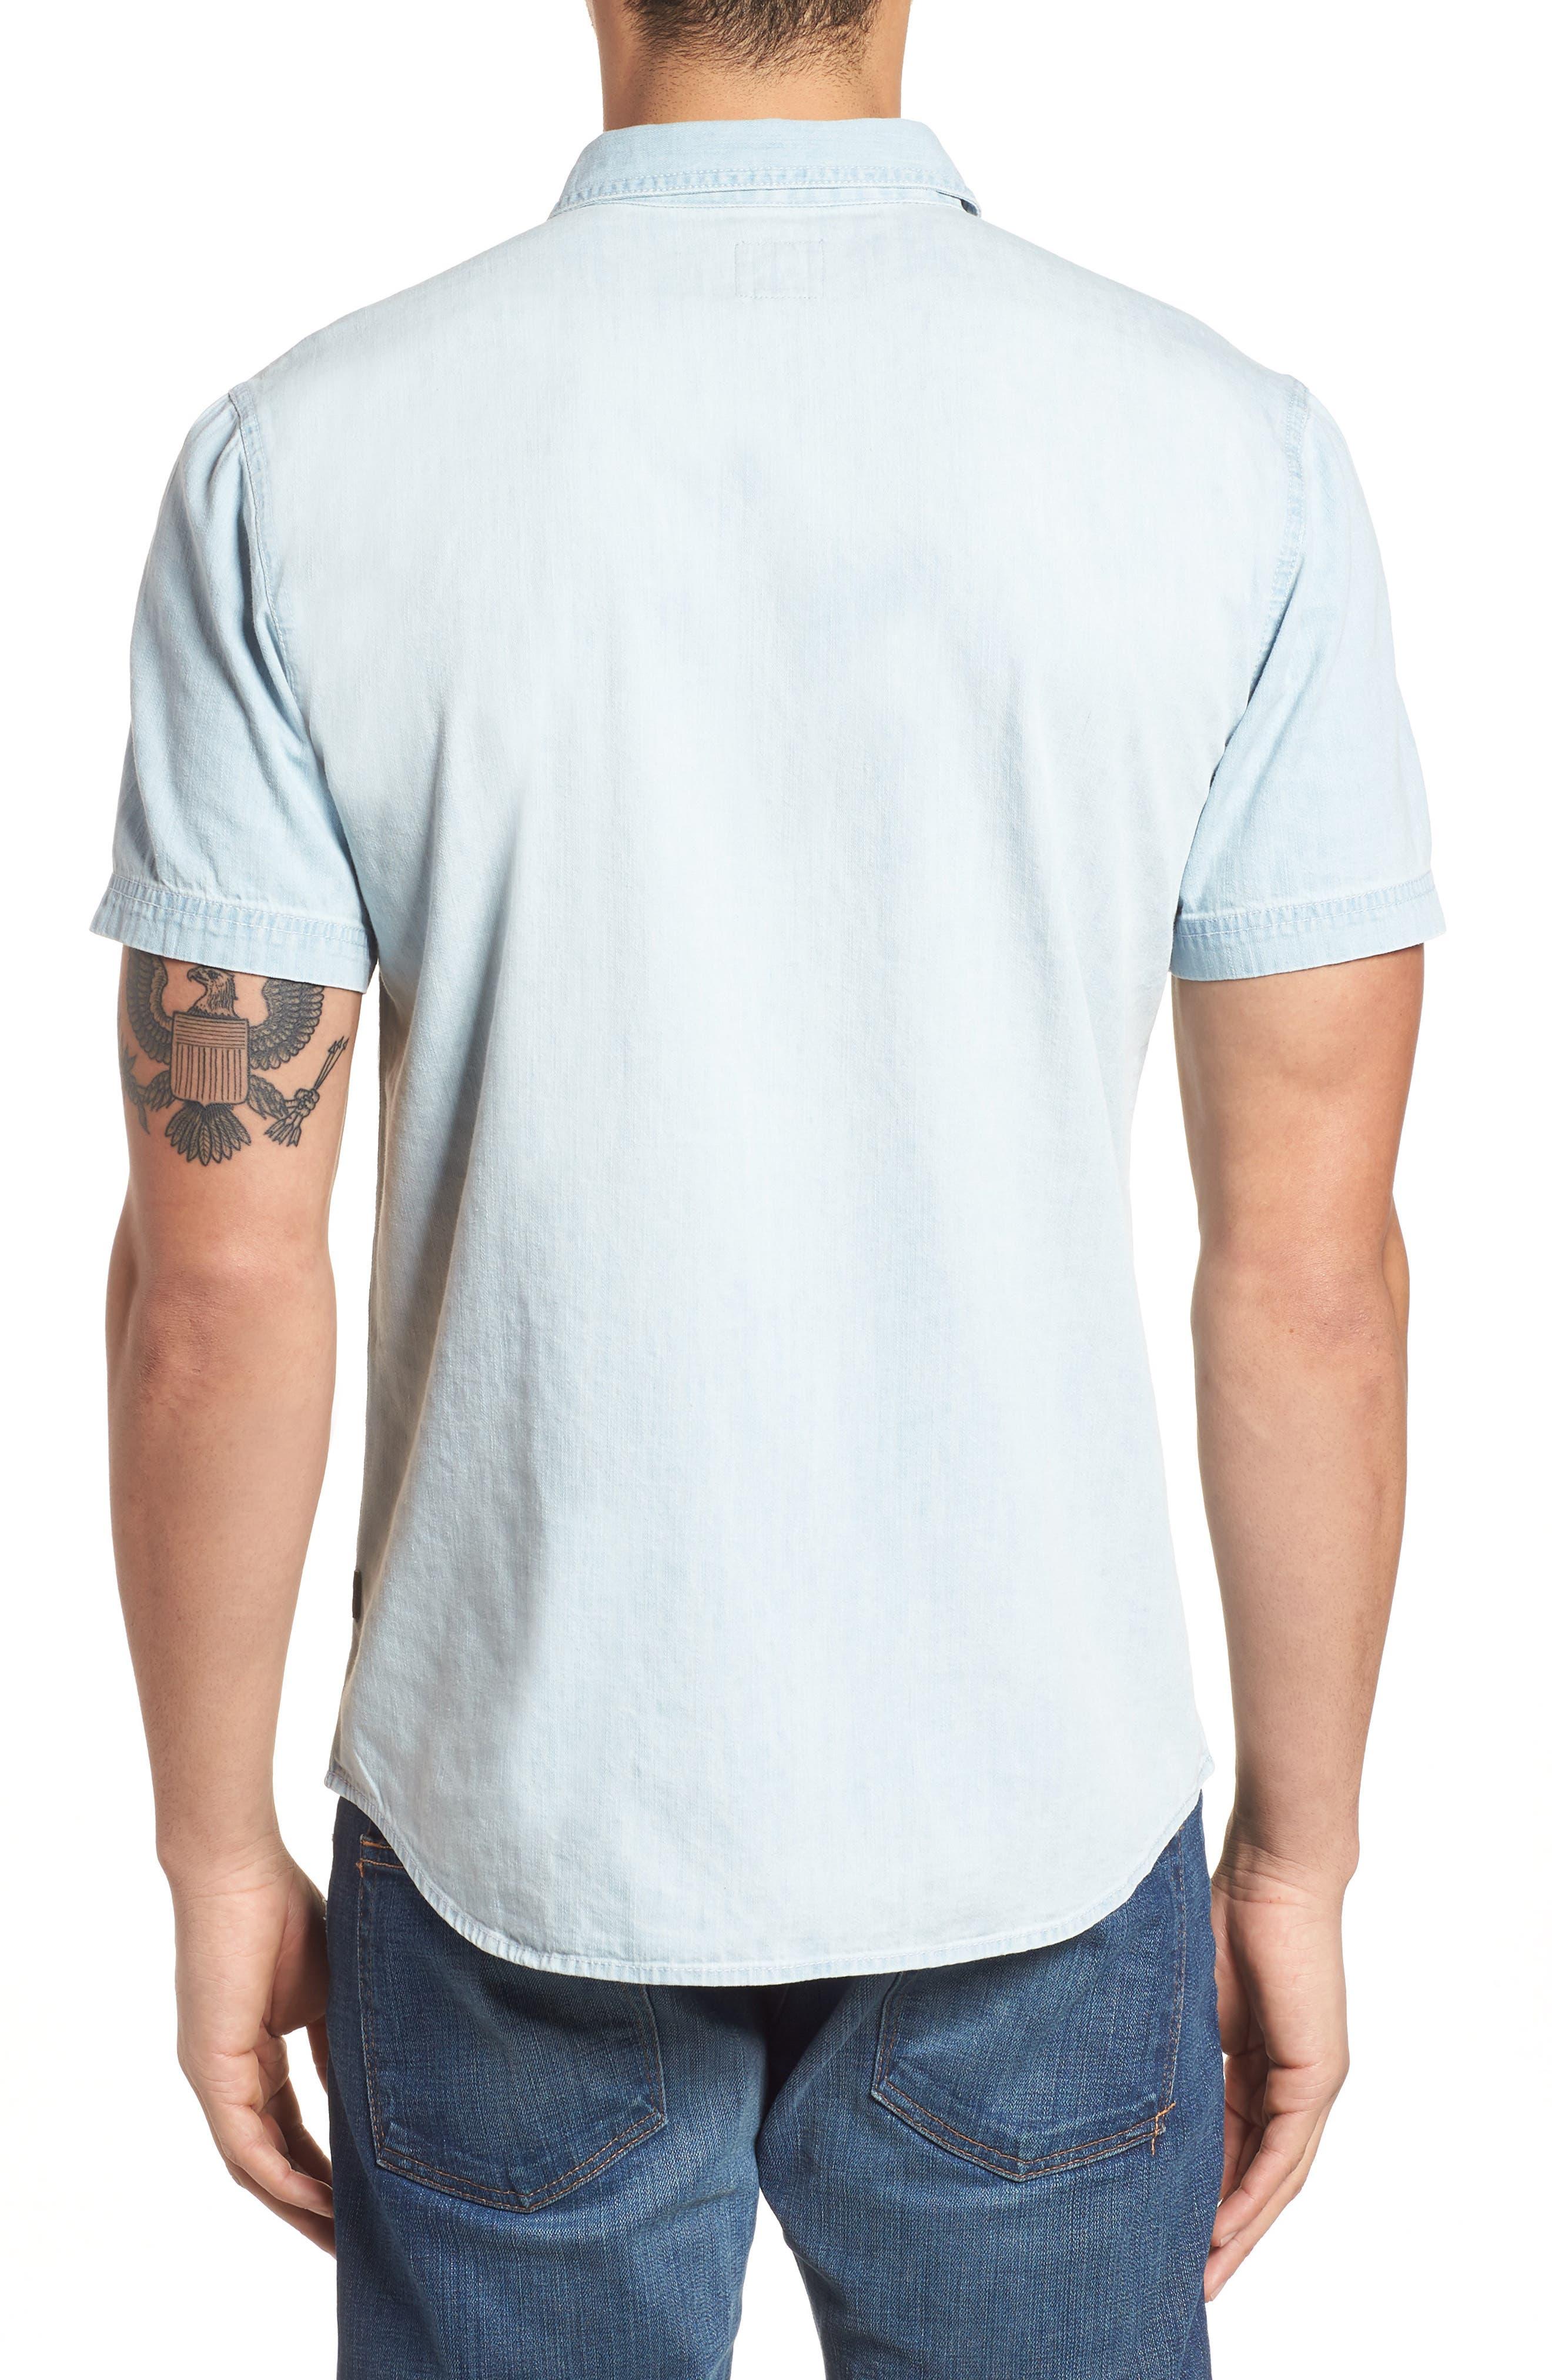 Sabotage Woven Shirt,                             Alternate thumbnail 2, color,                             020